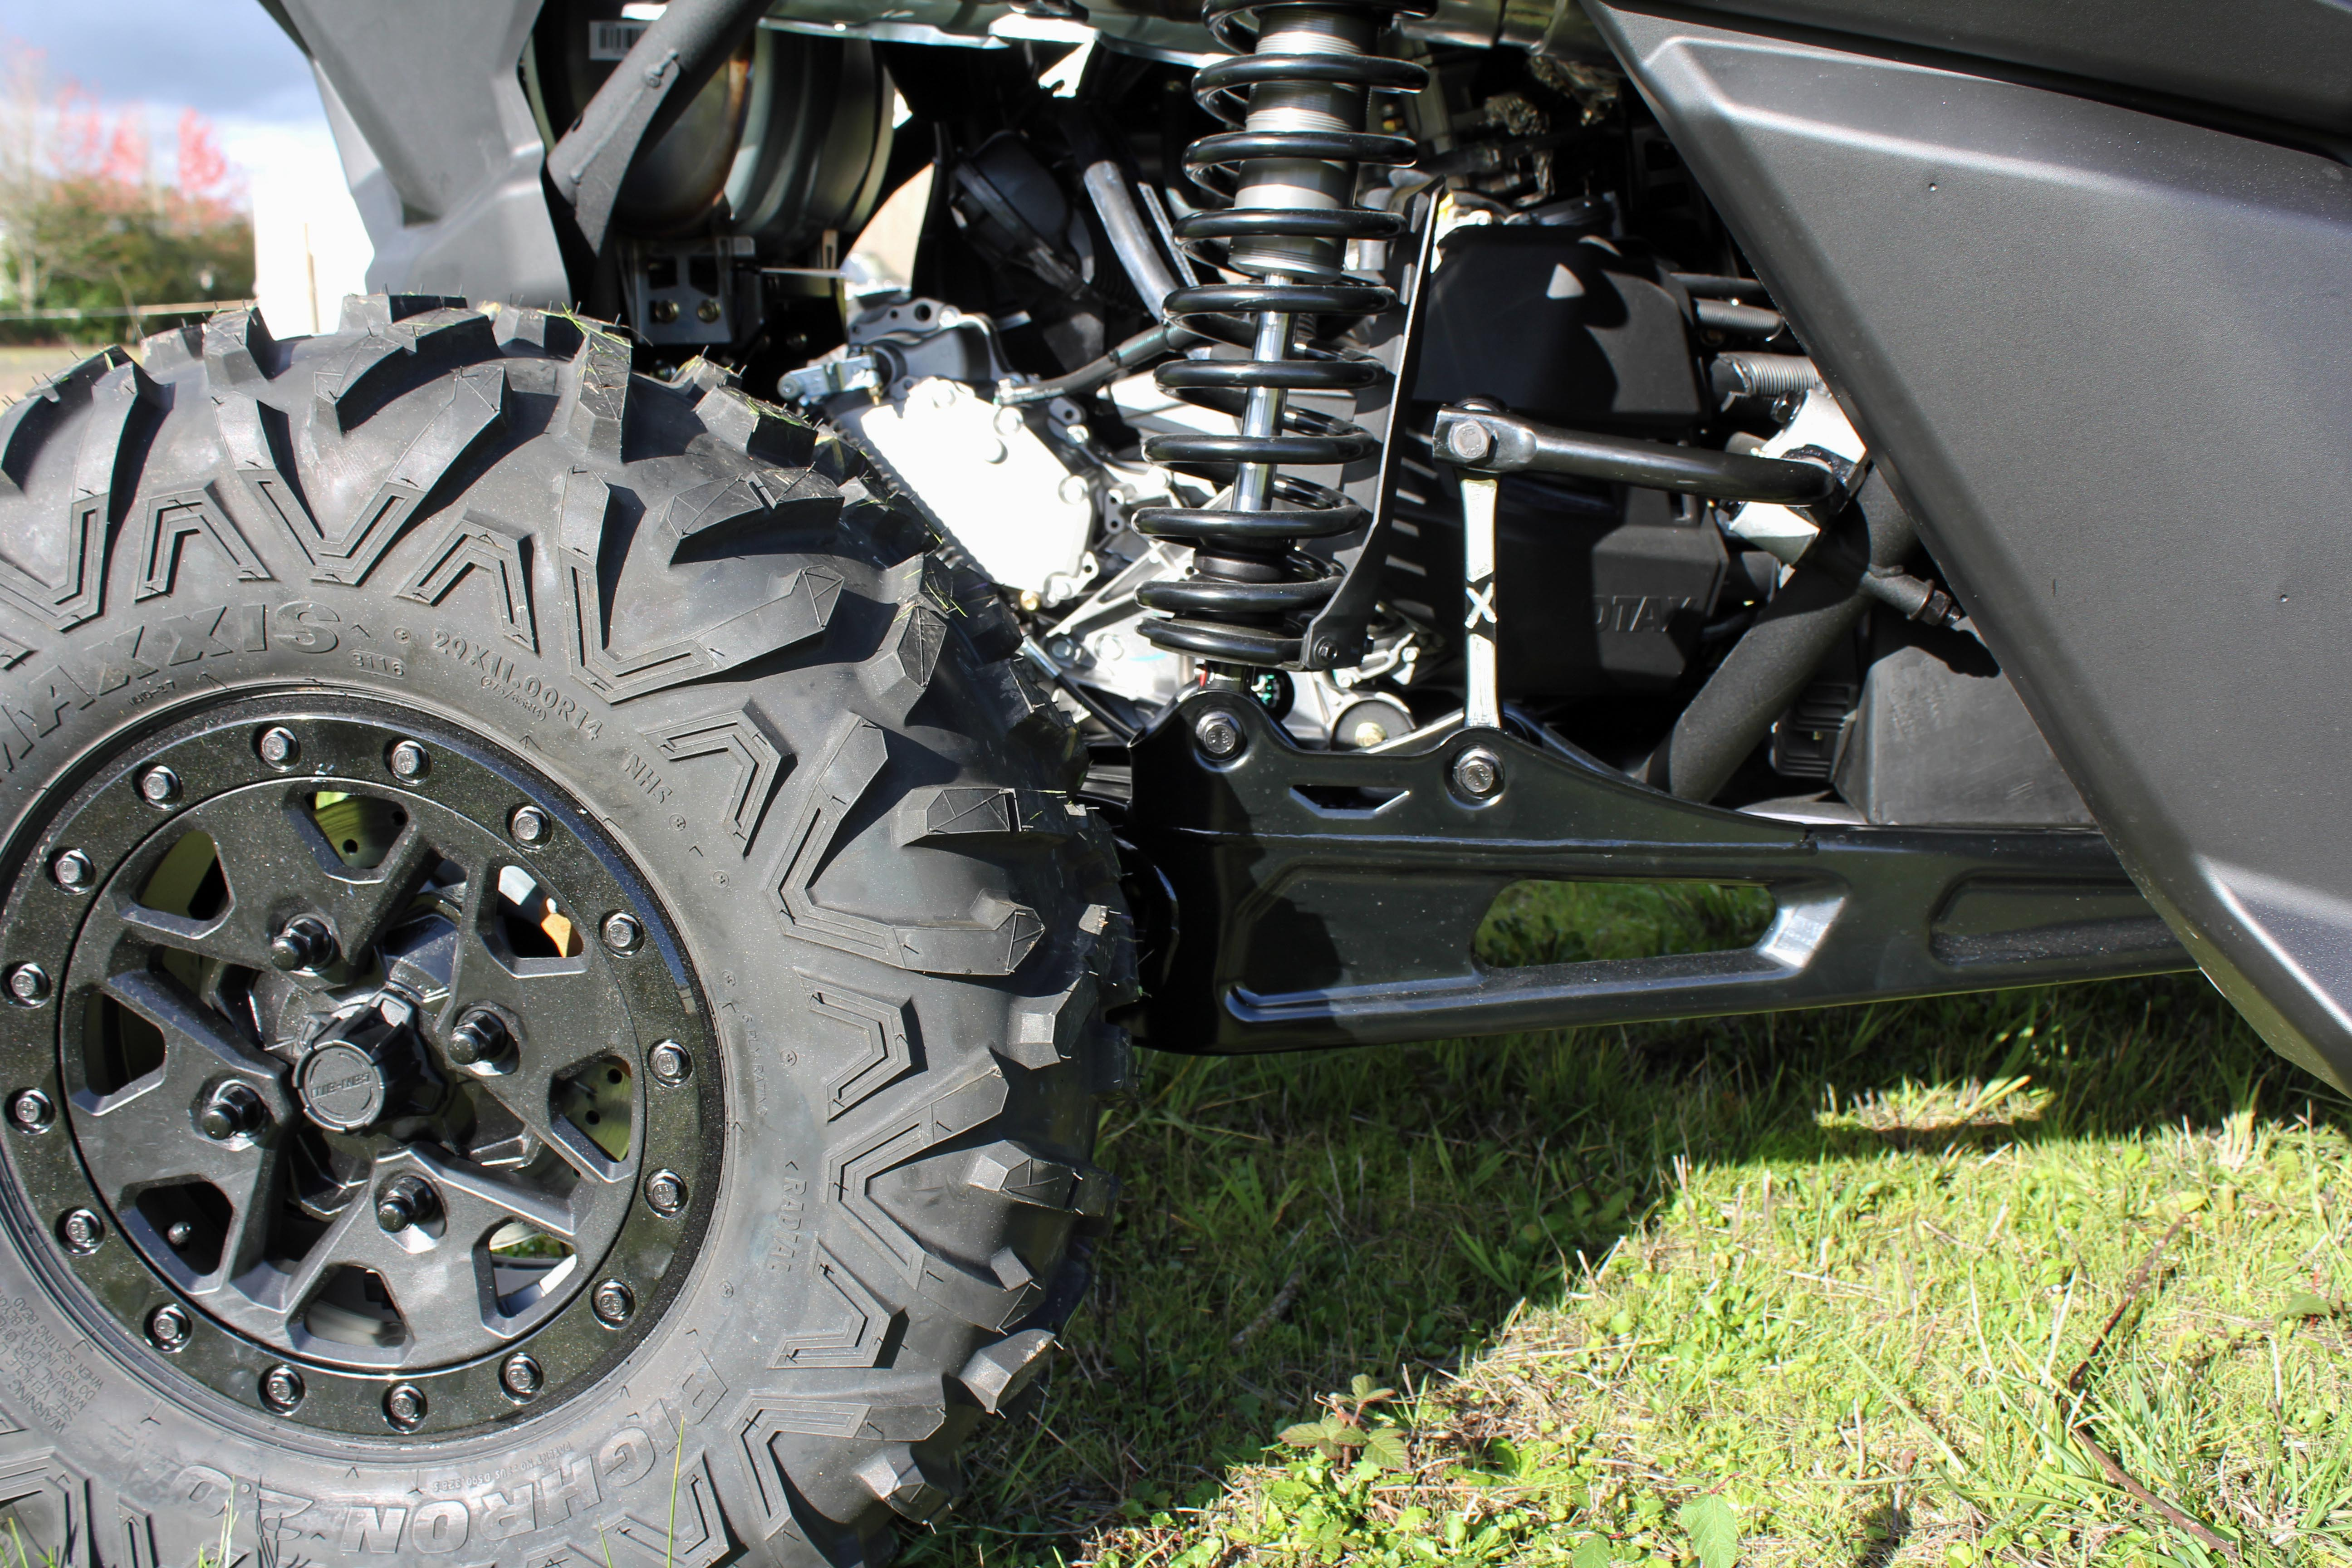 Black Billet Aluminum Rear Sway Bar End Links 2018 Can-Am Maverick X3 2 /& 4 Seat